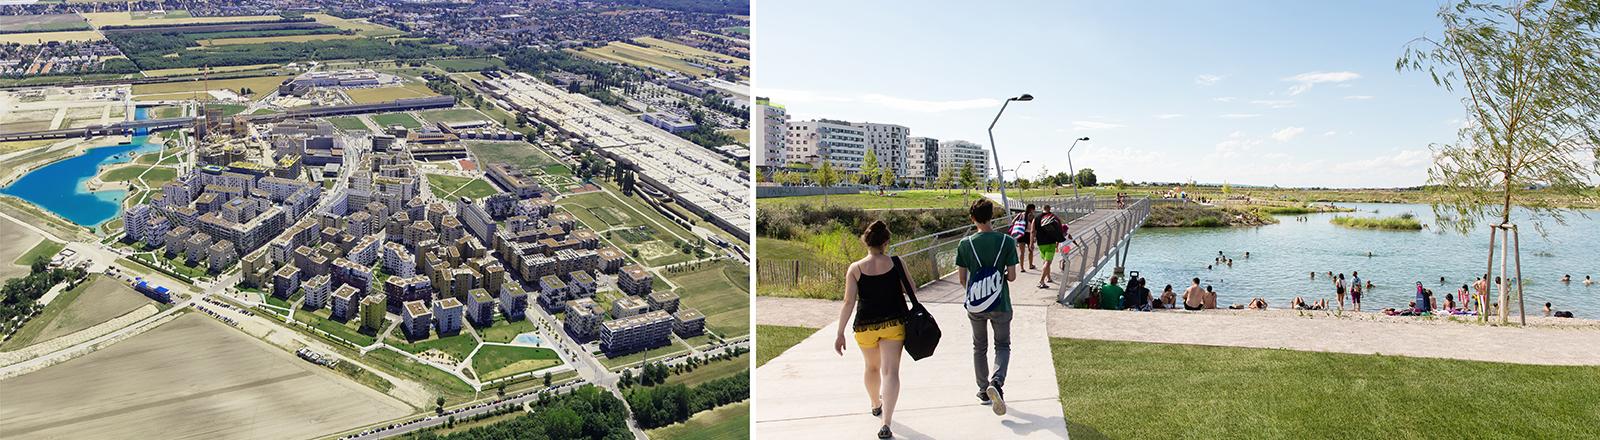 Planungsmodelle des Wiener Stadtteils Seestadt Aspern